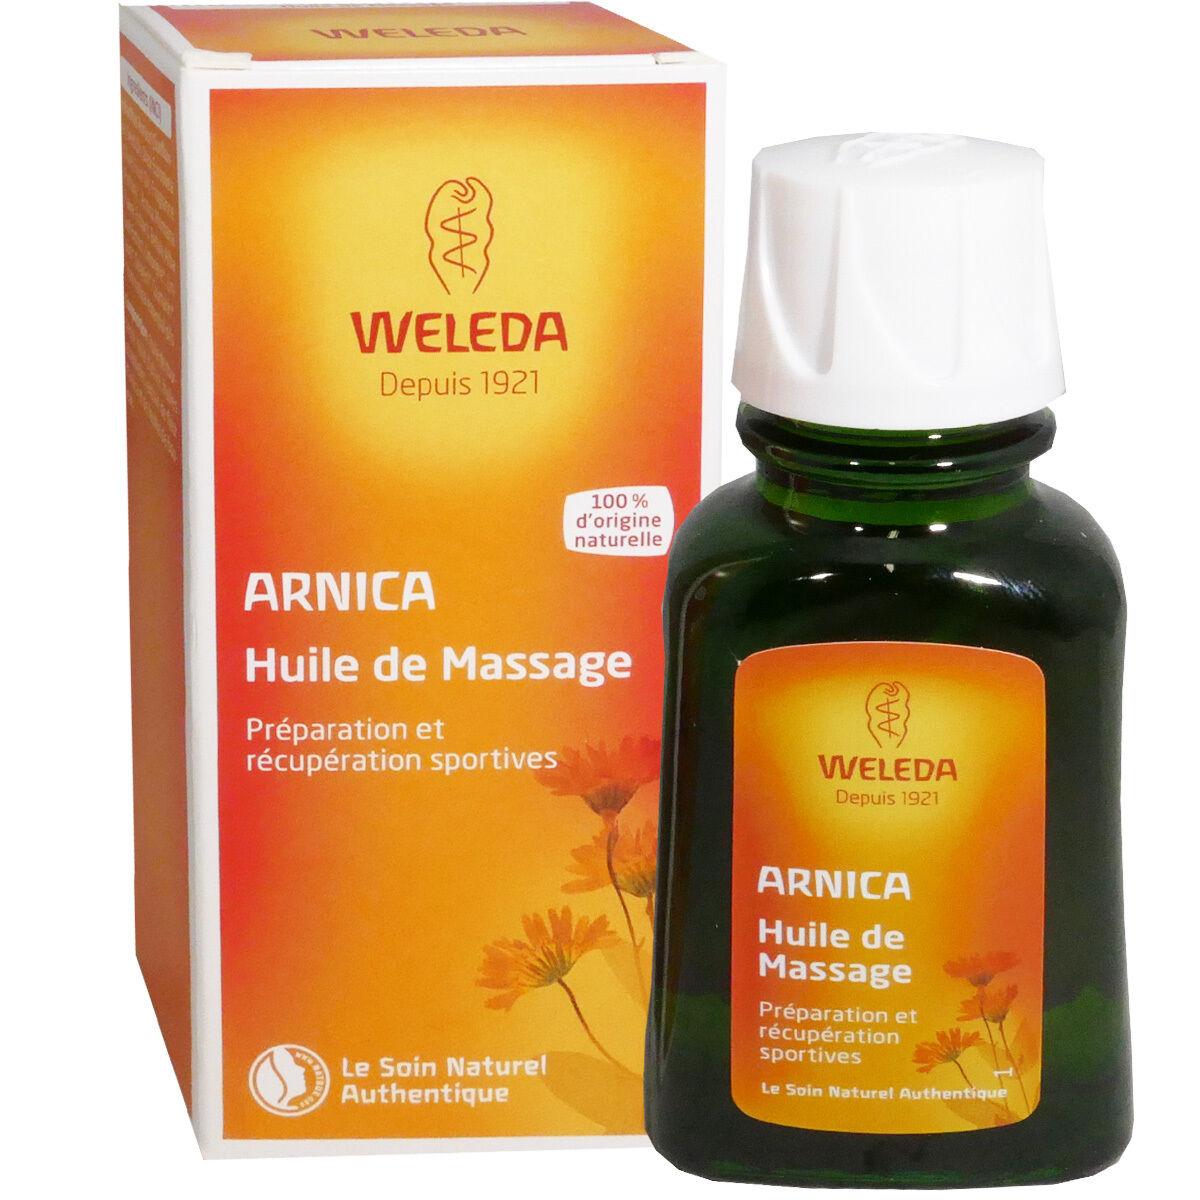 Weleda huile de massage a l'arnica 50ml